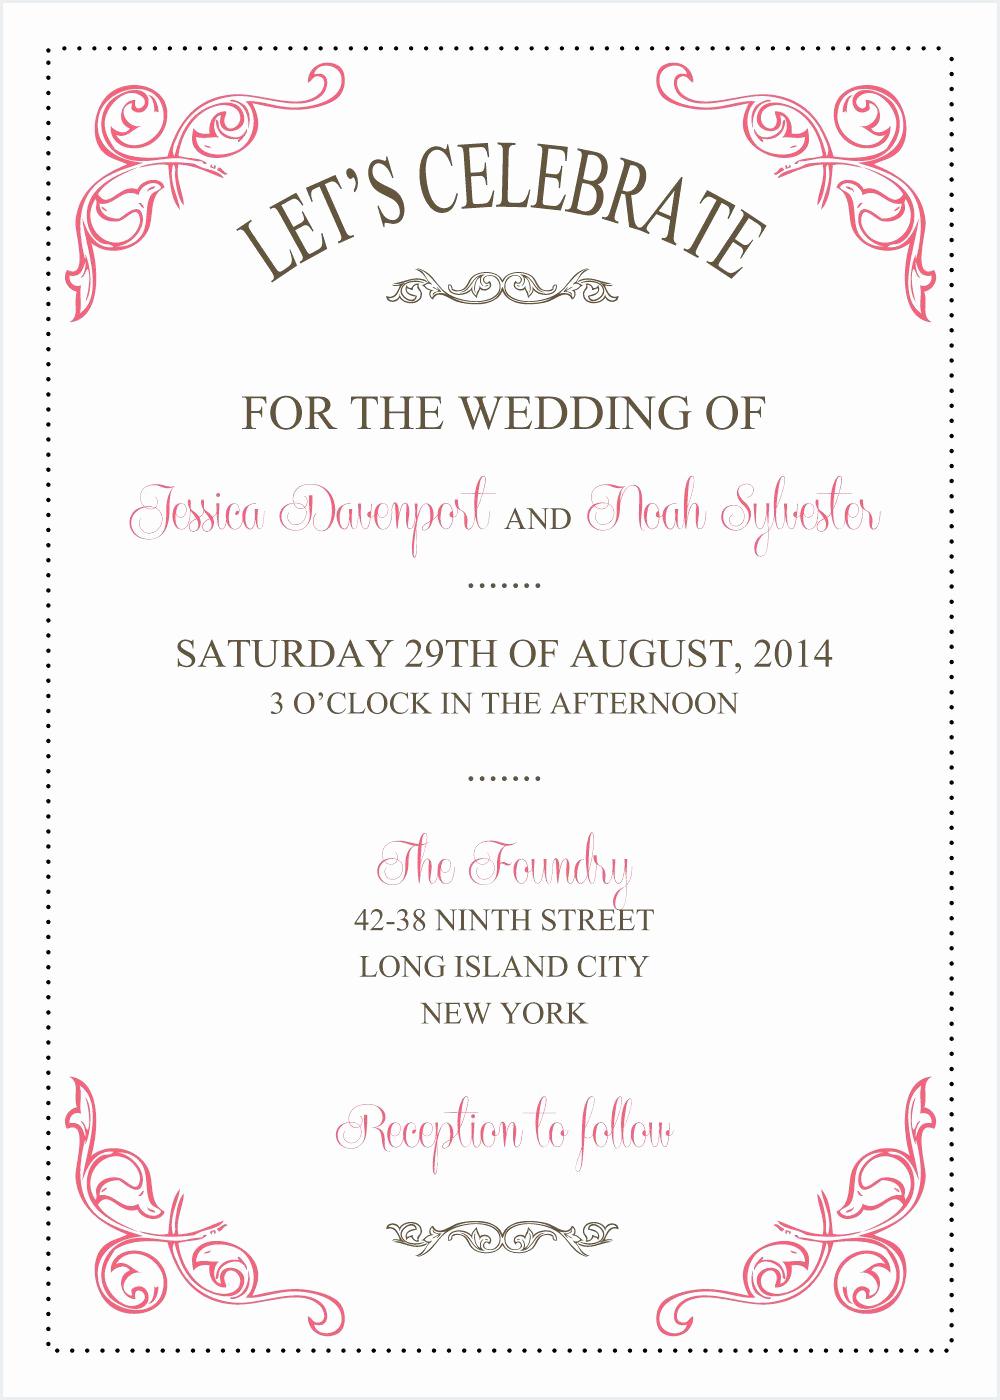 Wedding Invitation Templates Word Beautiful Wedding Invitations Template Wedding Invitations